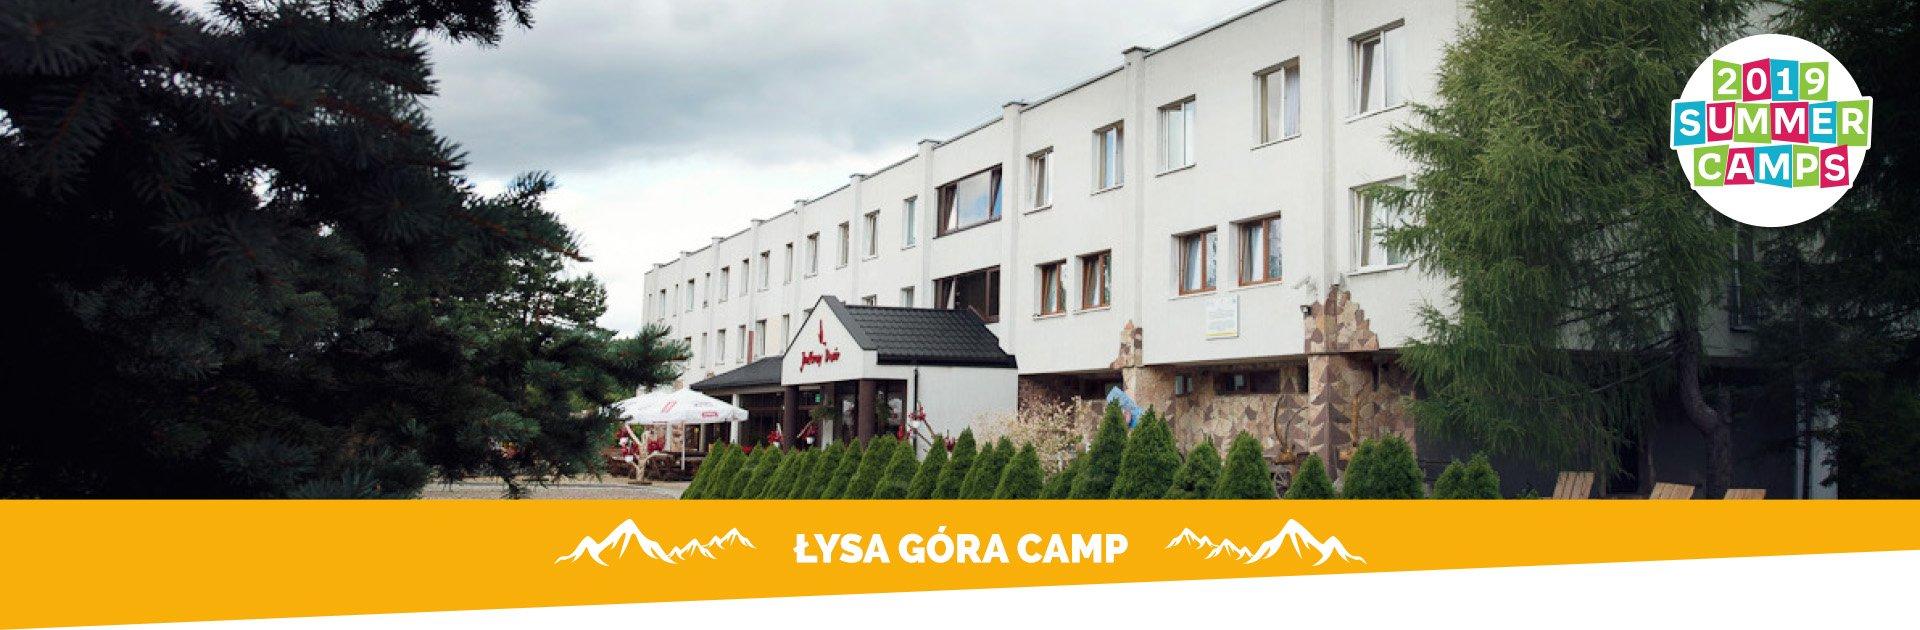 banner_gora_lysa_gora